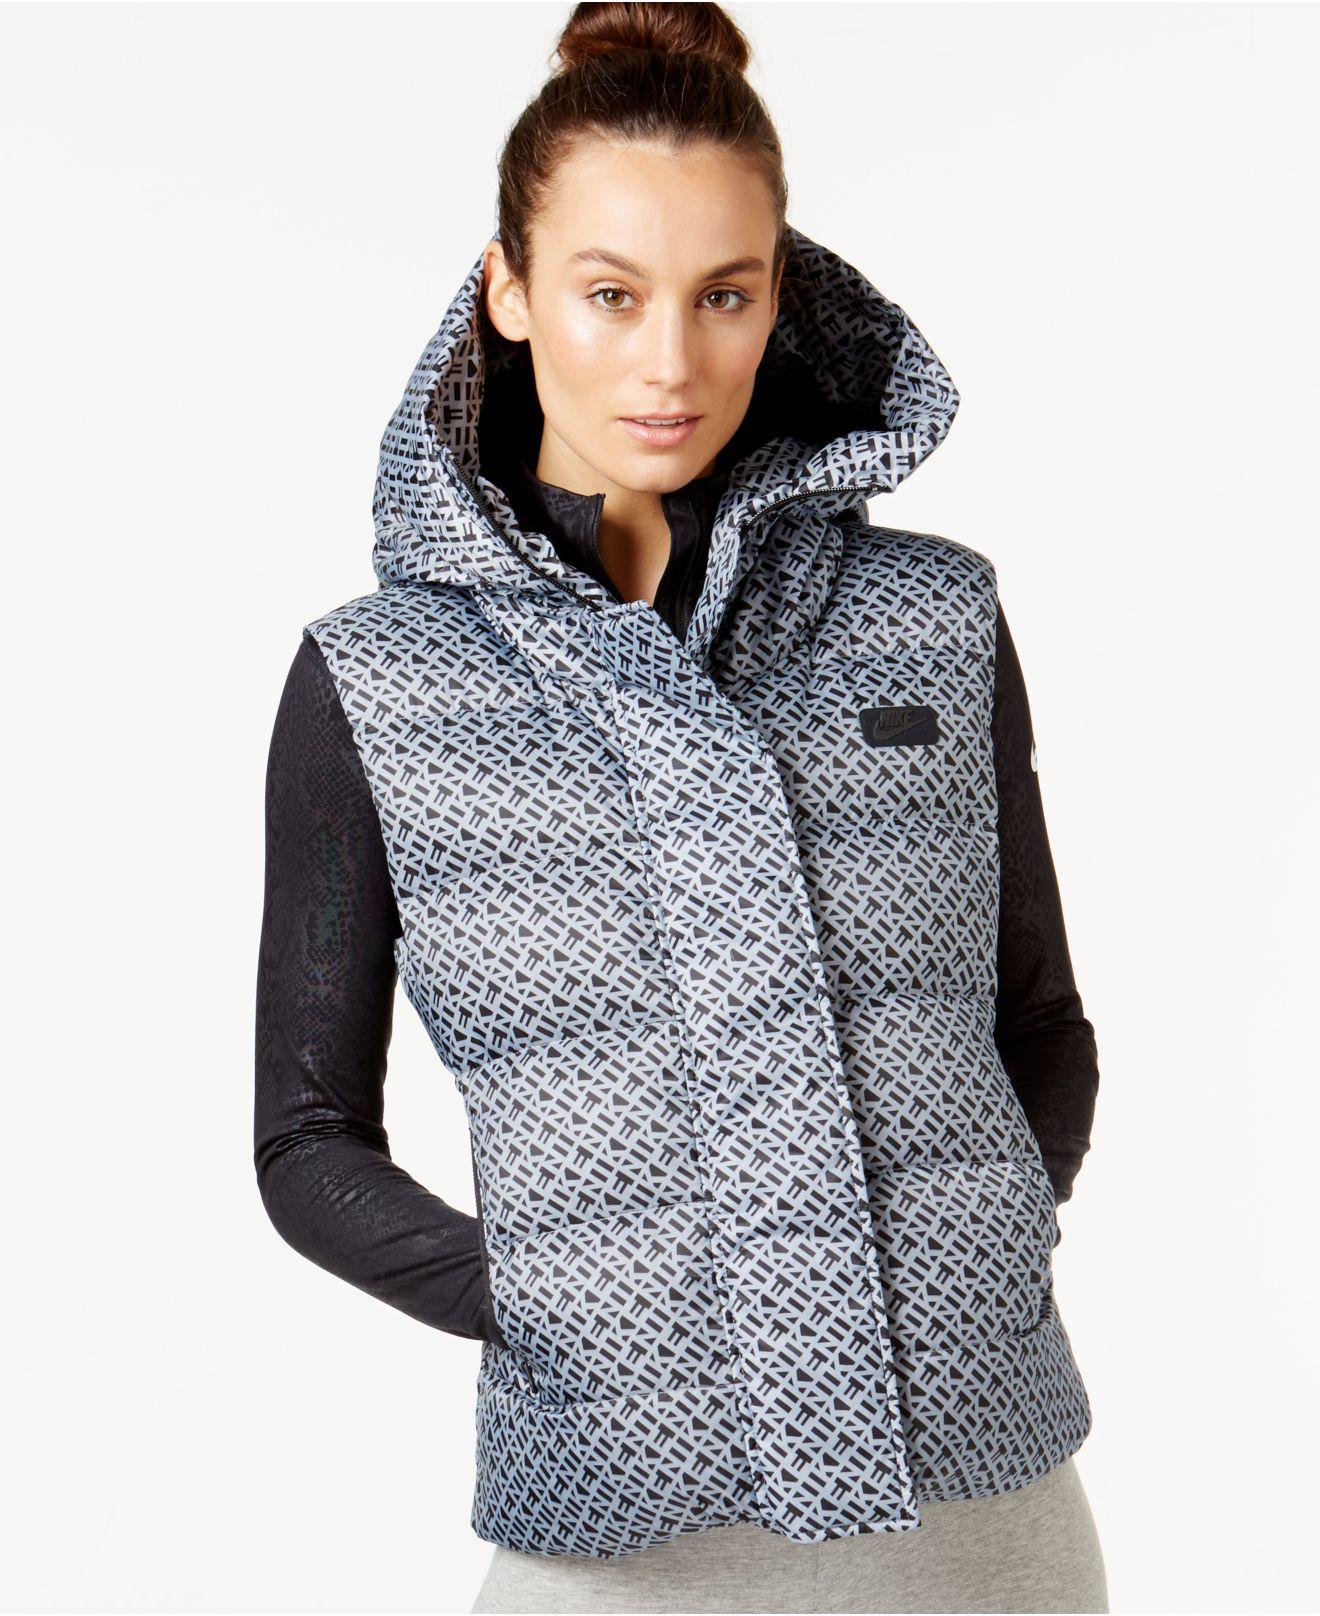 24996abeacf4 Nike Down Vest With Hood unit4motors.co.uk